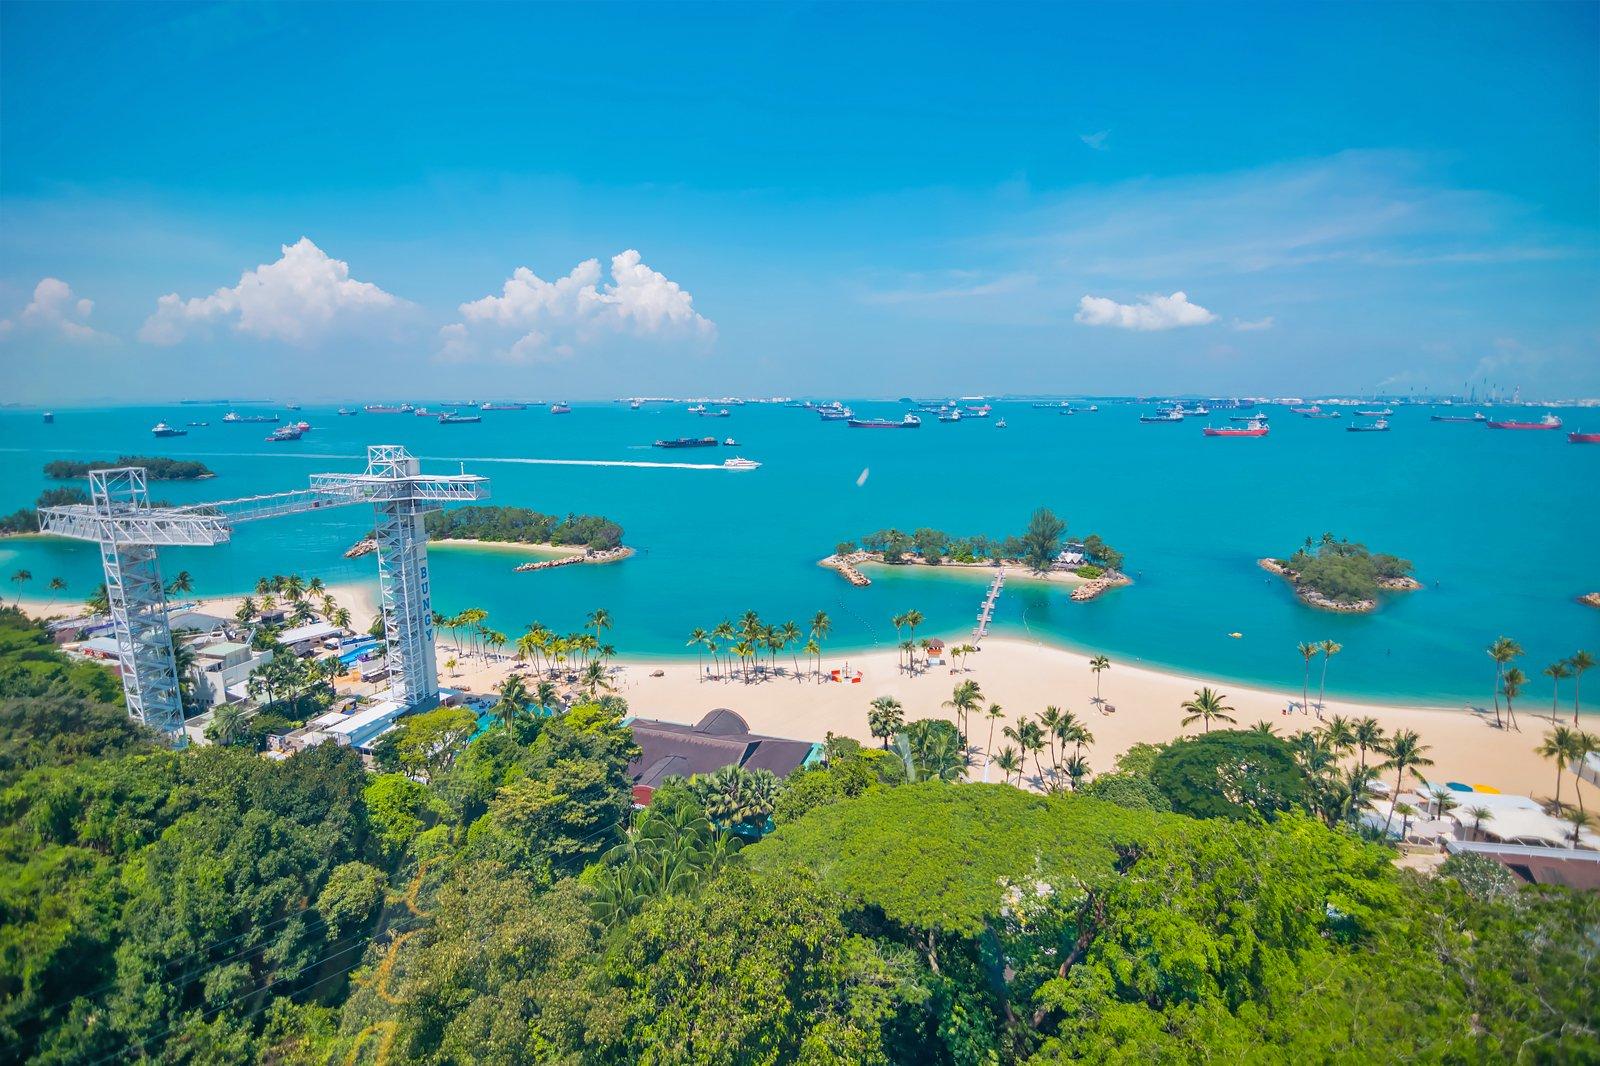 Siloso Beach Singapore - Popular Beach in Sentosa